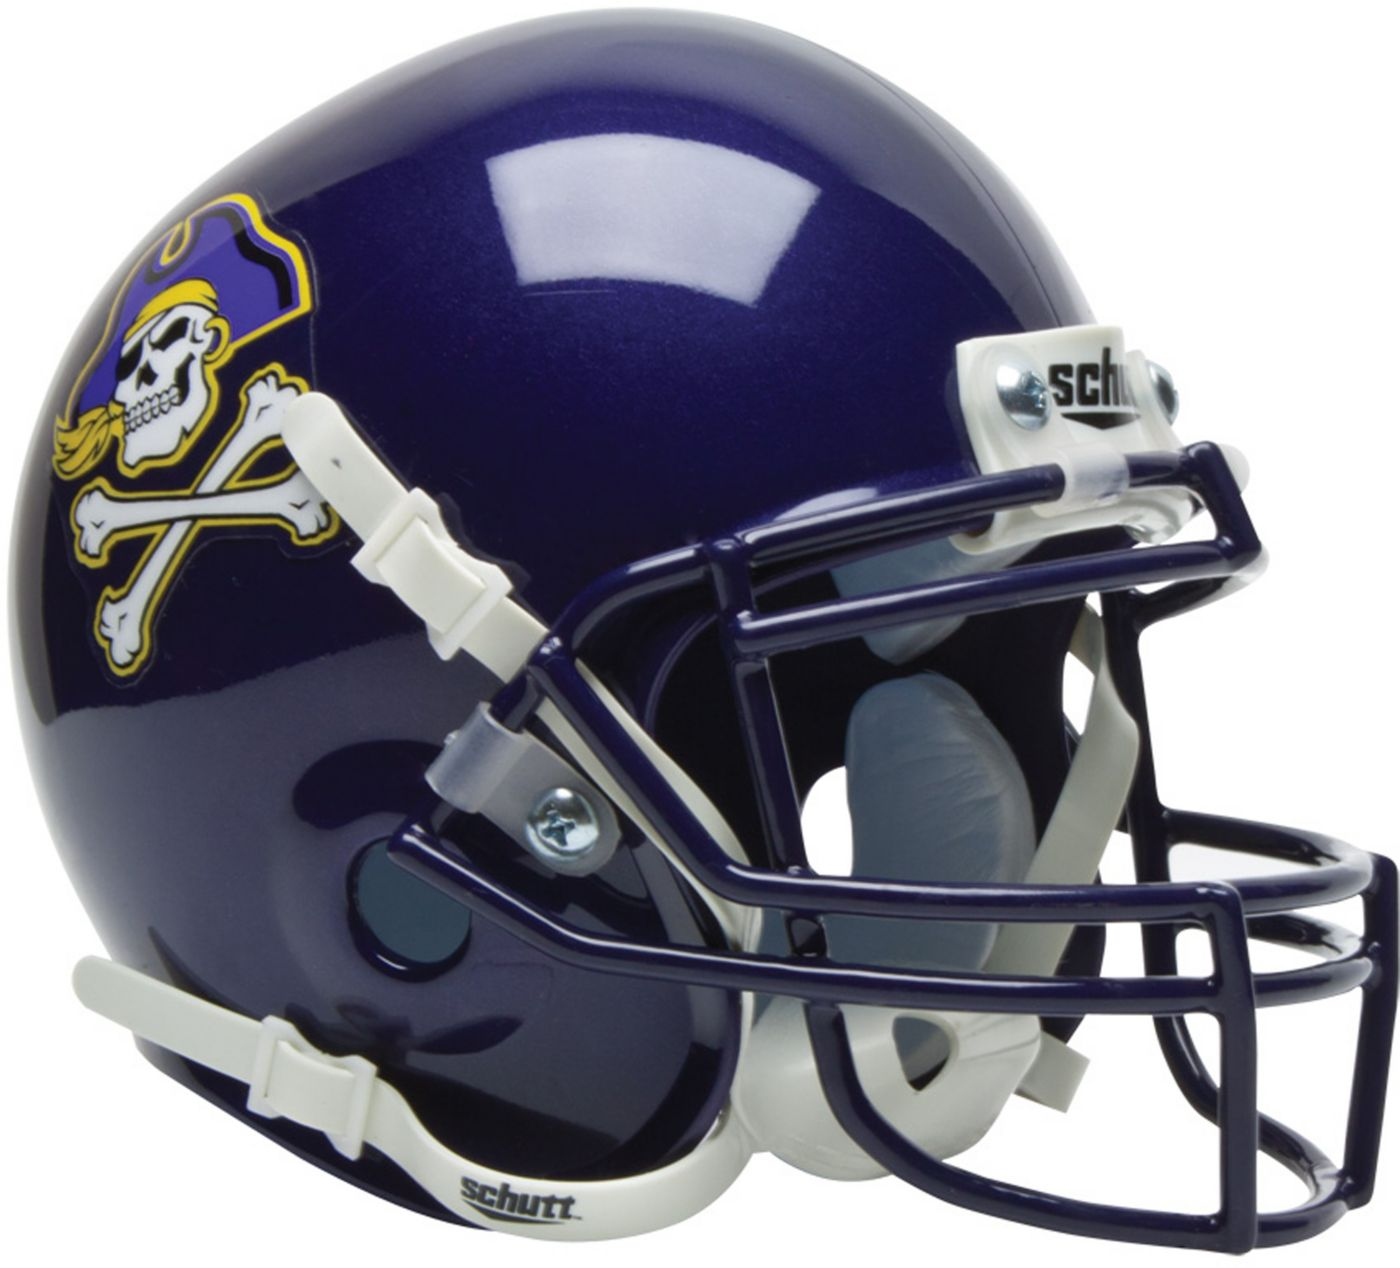 Schutt East Carolina Pirates Mini Authentic Football Helmet